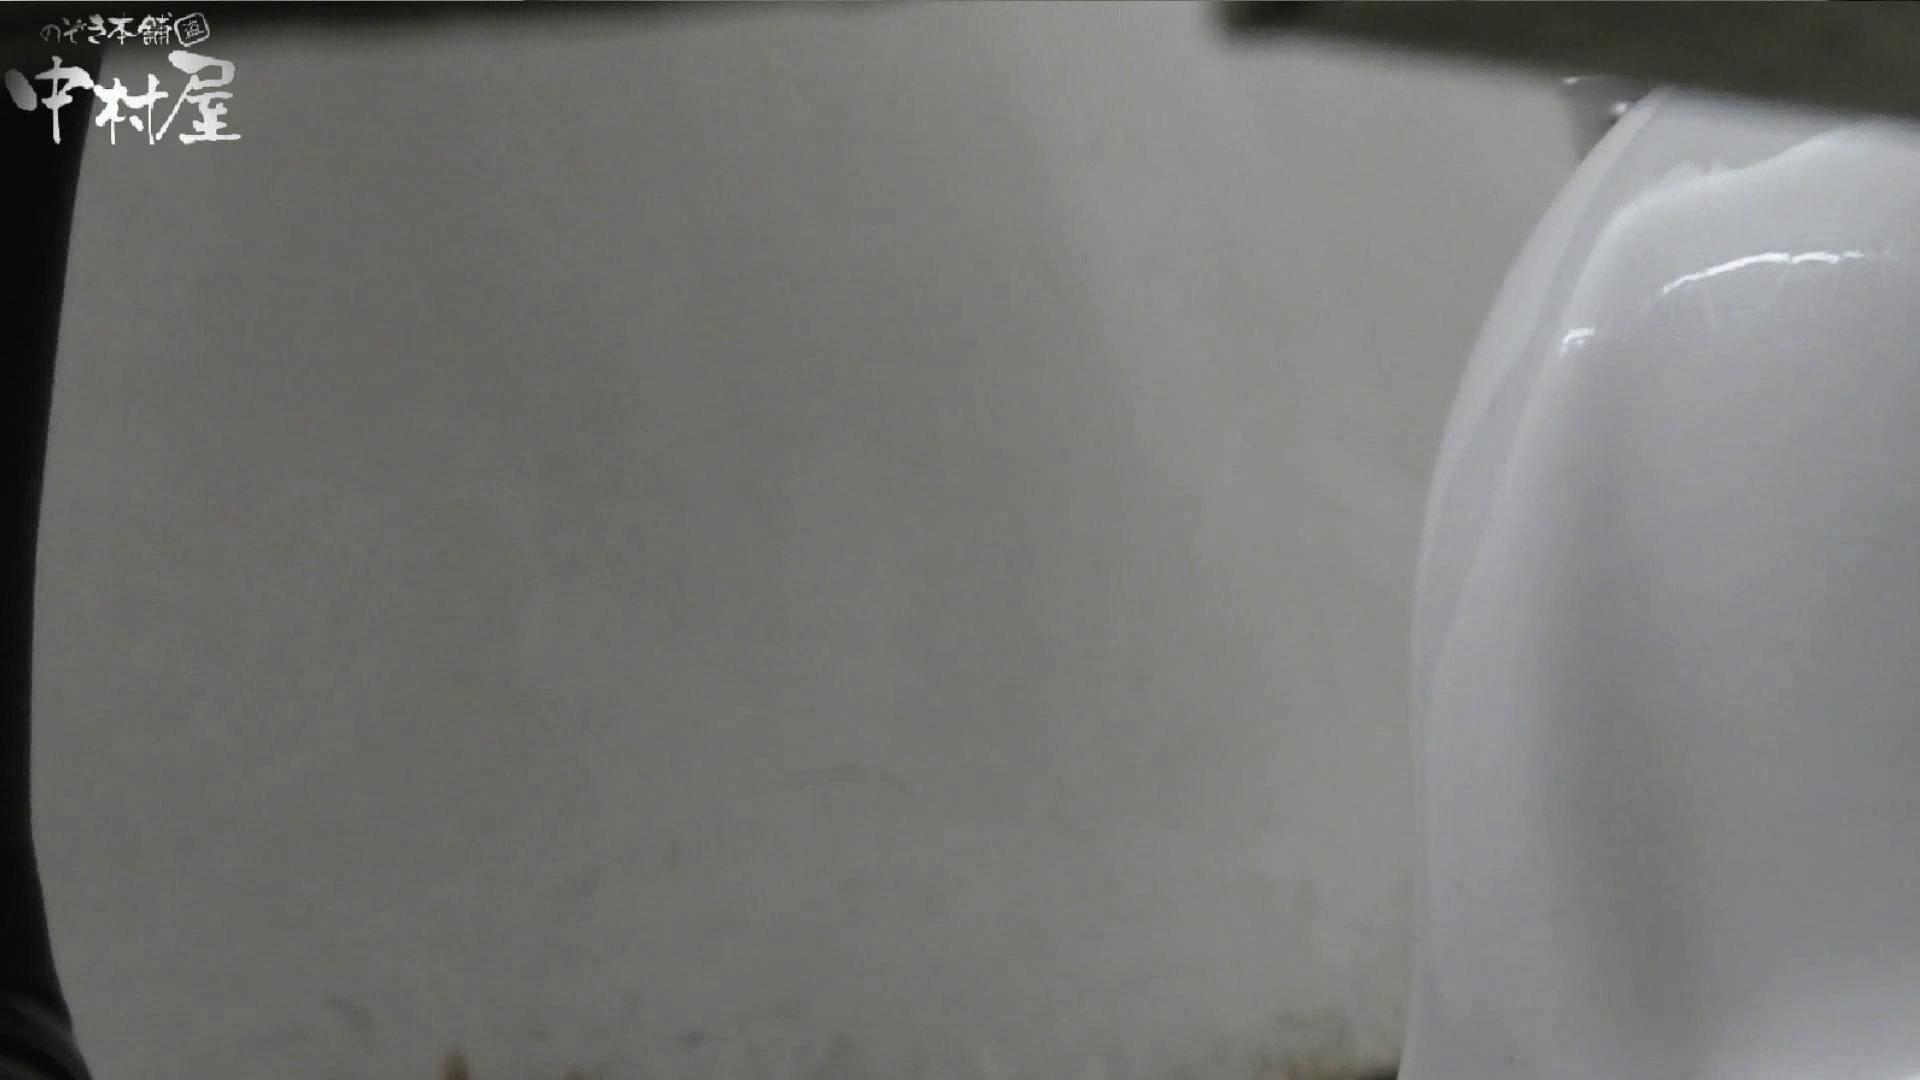 vol.25 命がけ潜伏洗面所! 咥えタオルは剛毛の証!? 洗面所 SEX無修正画像 105連発 26